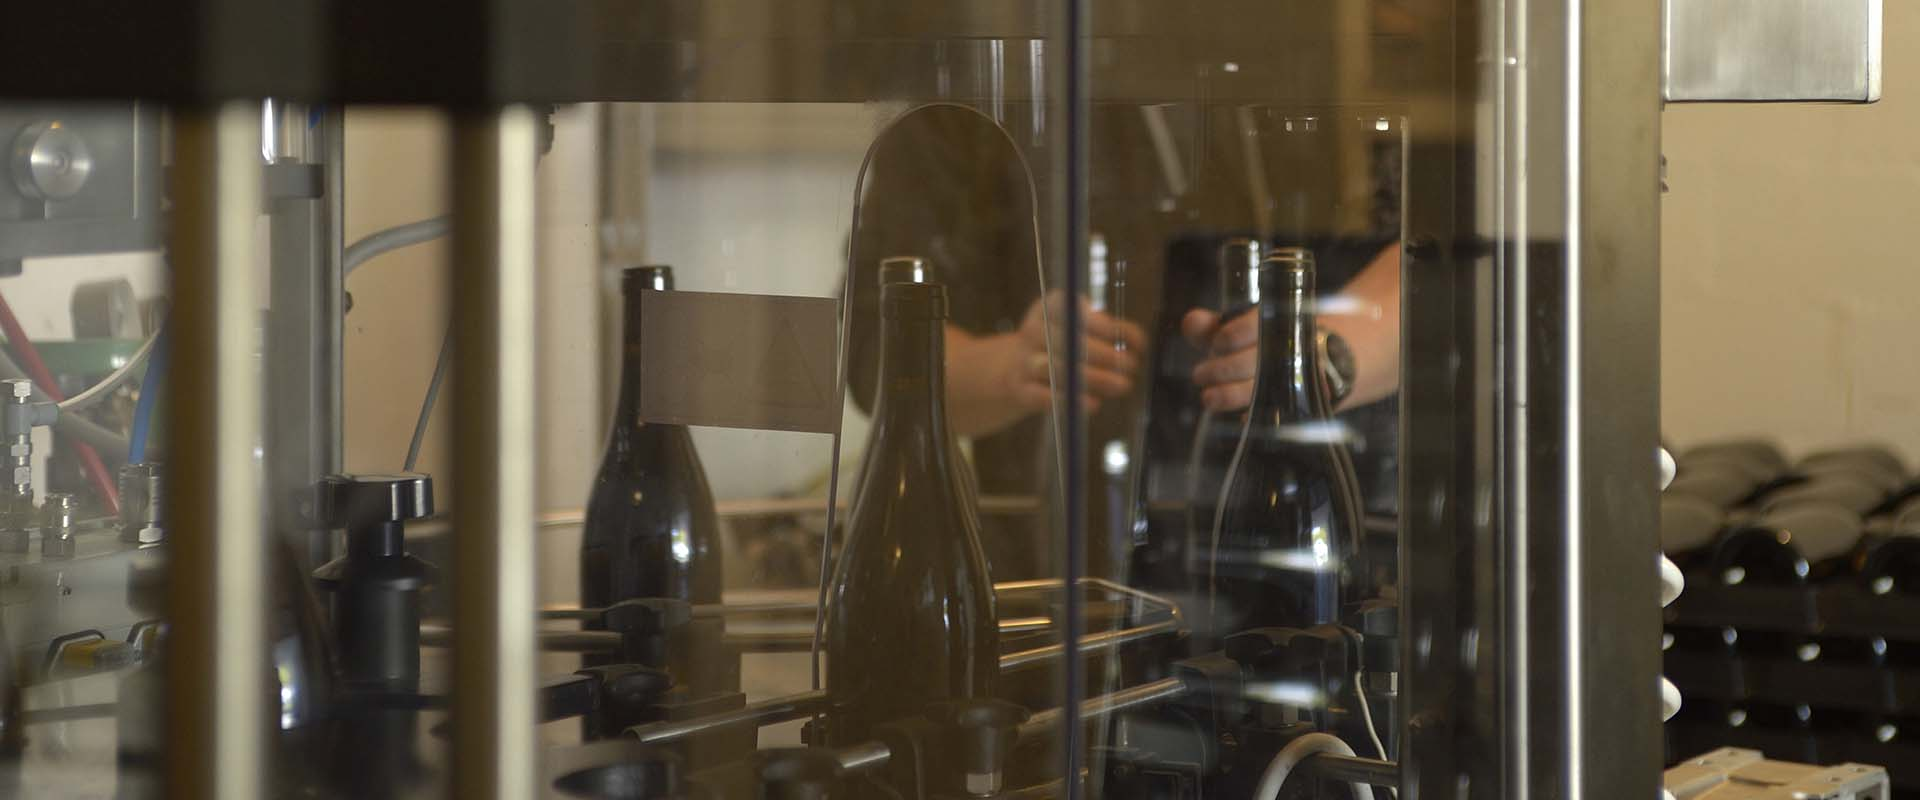 Weingut Rütihof - Monat April